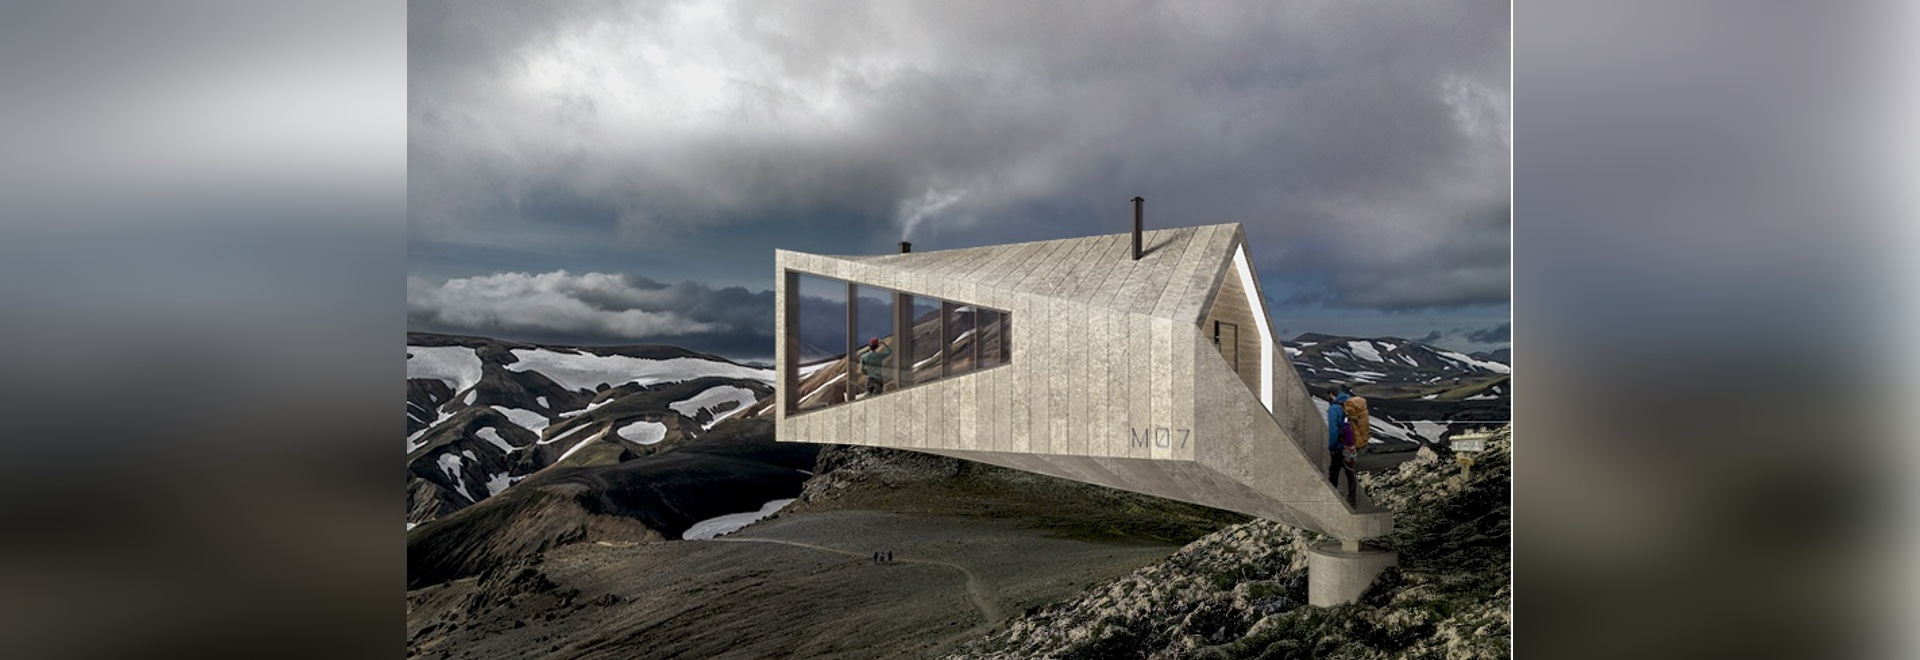 school studio plans trekking cabins for iceland's remote highlands